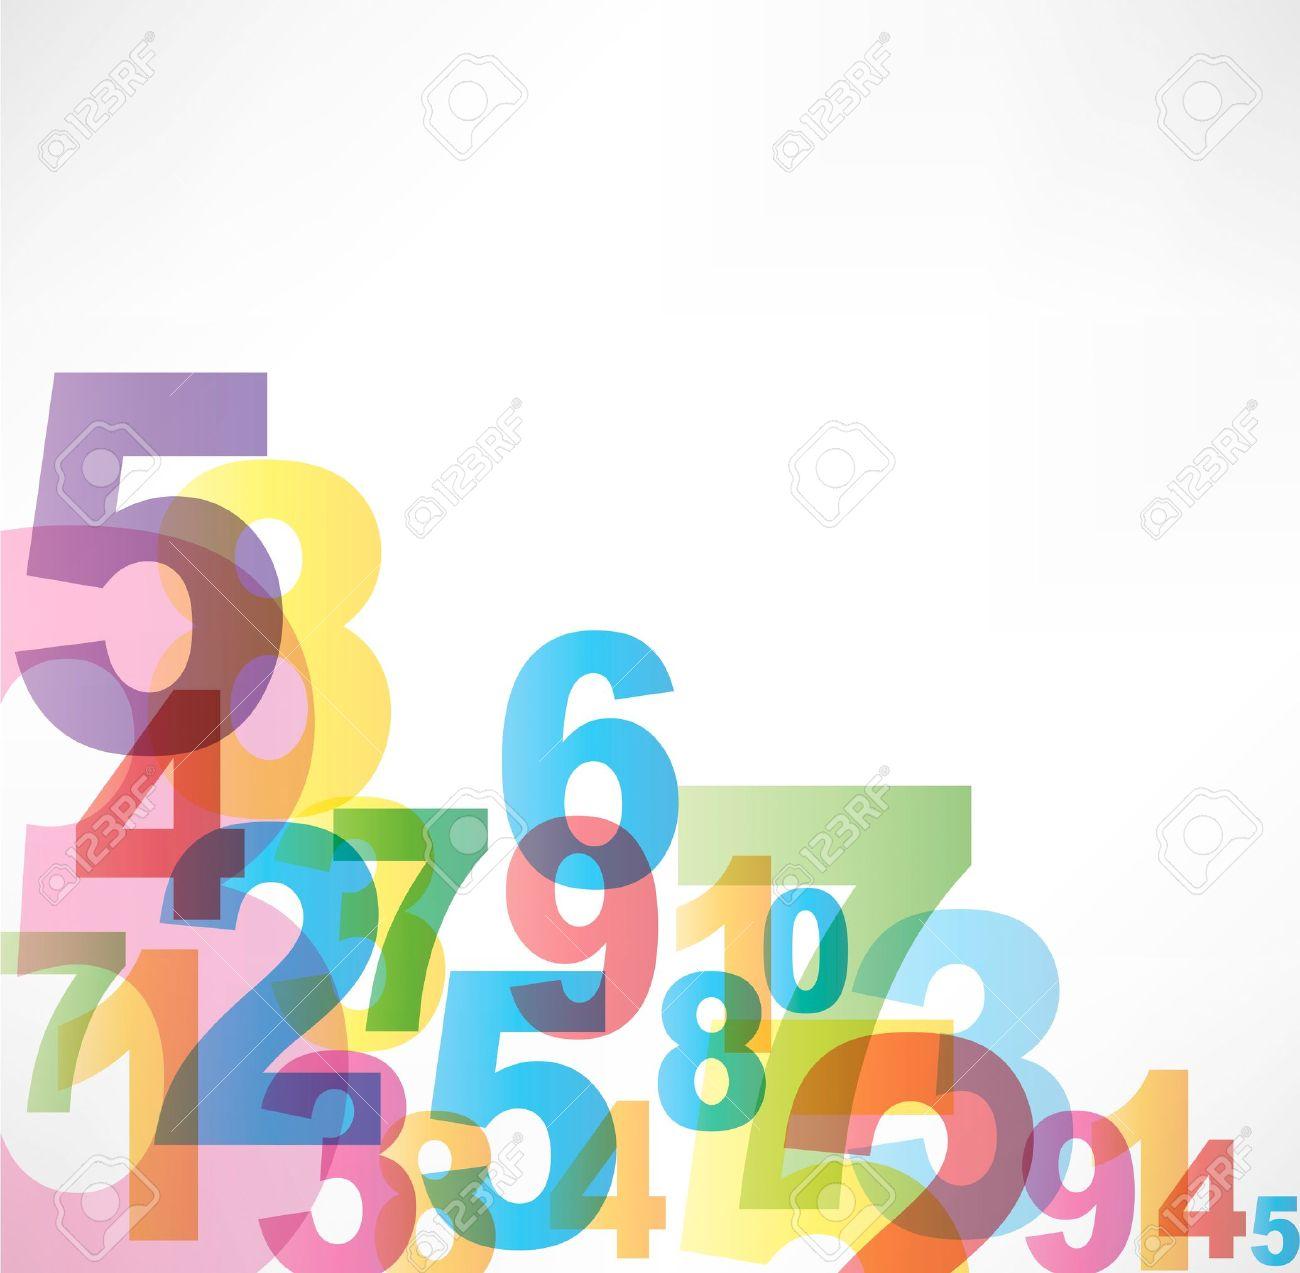 Jumbled Numbers Jumbled Numbers Background